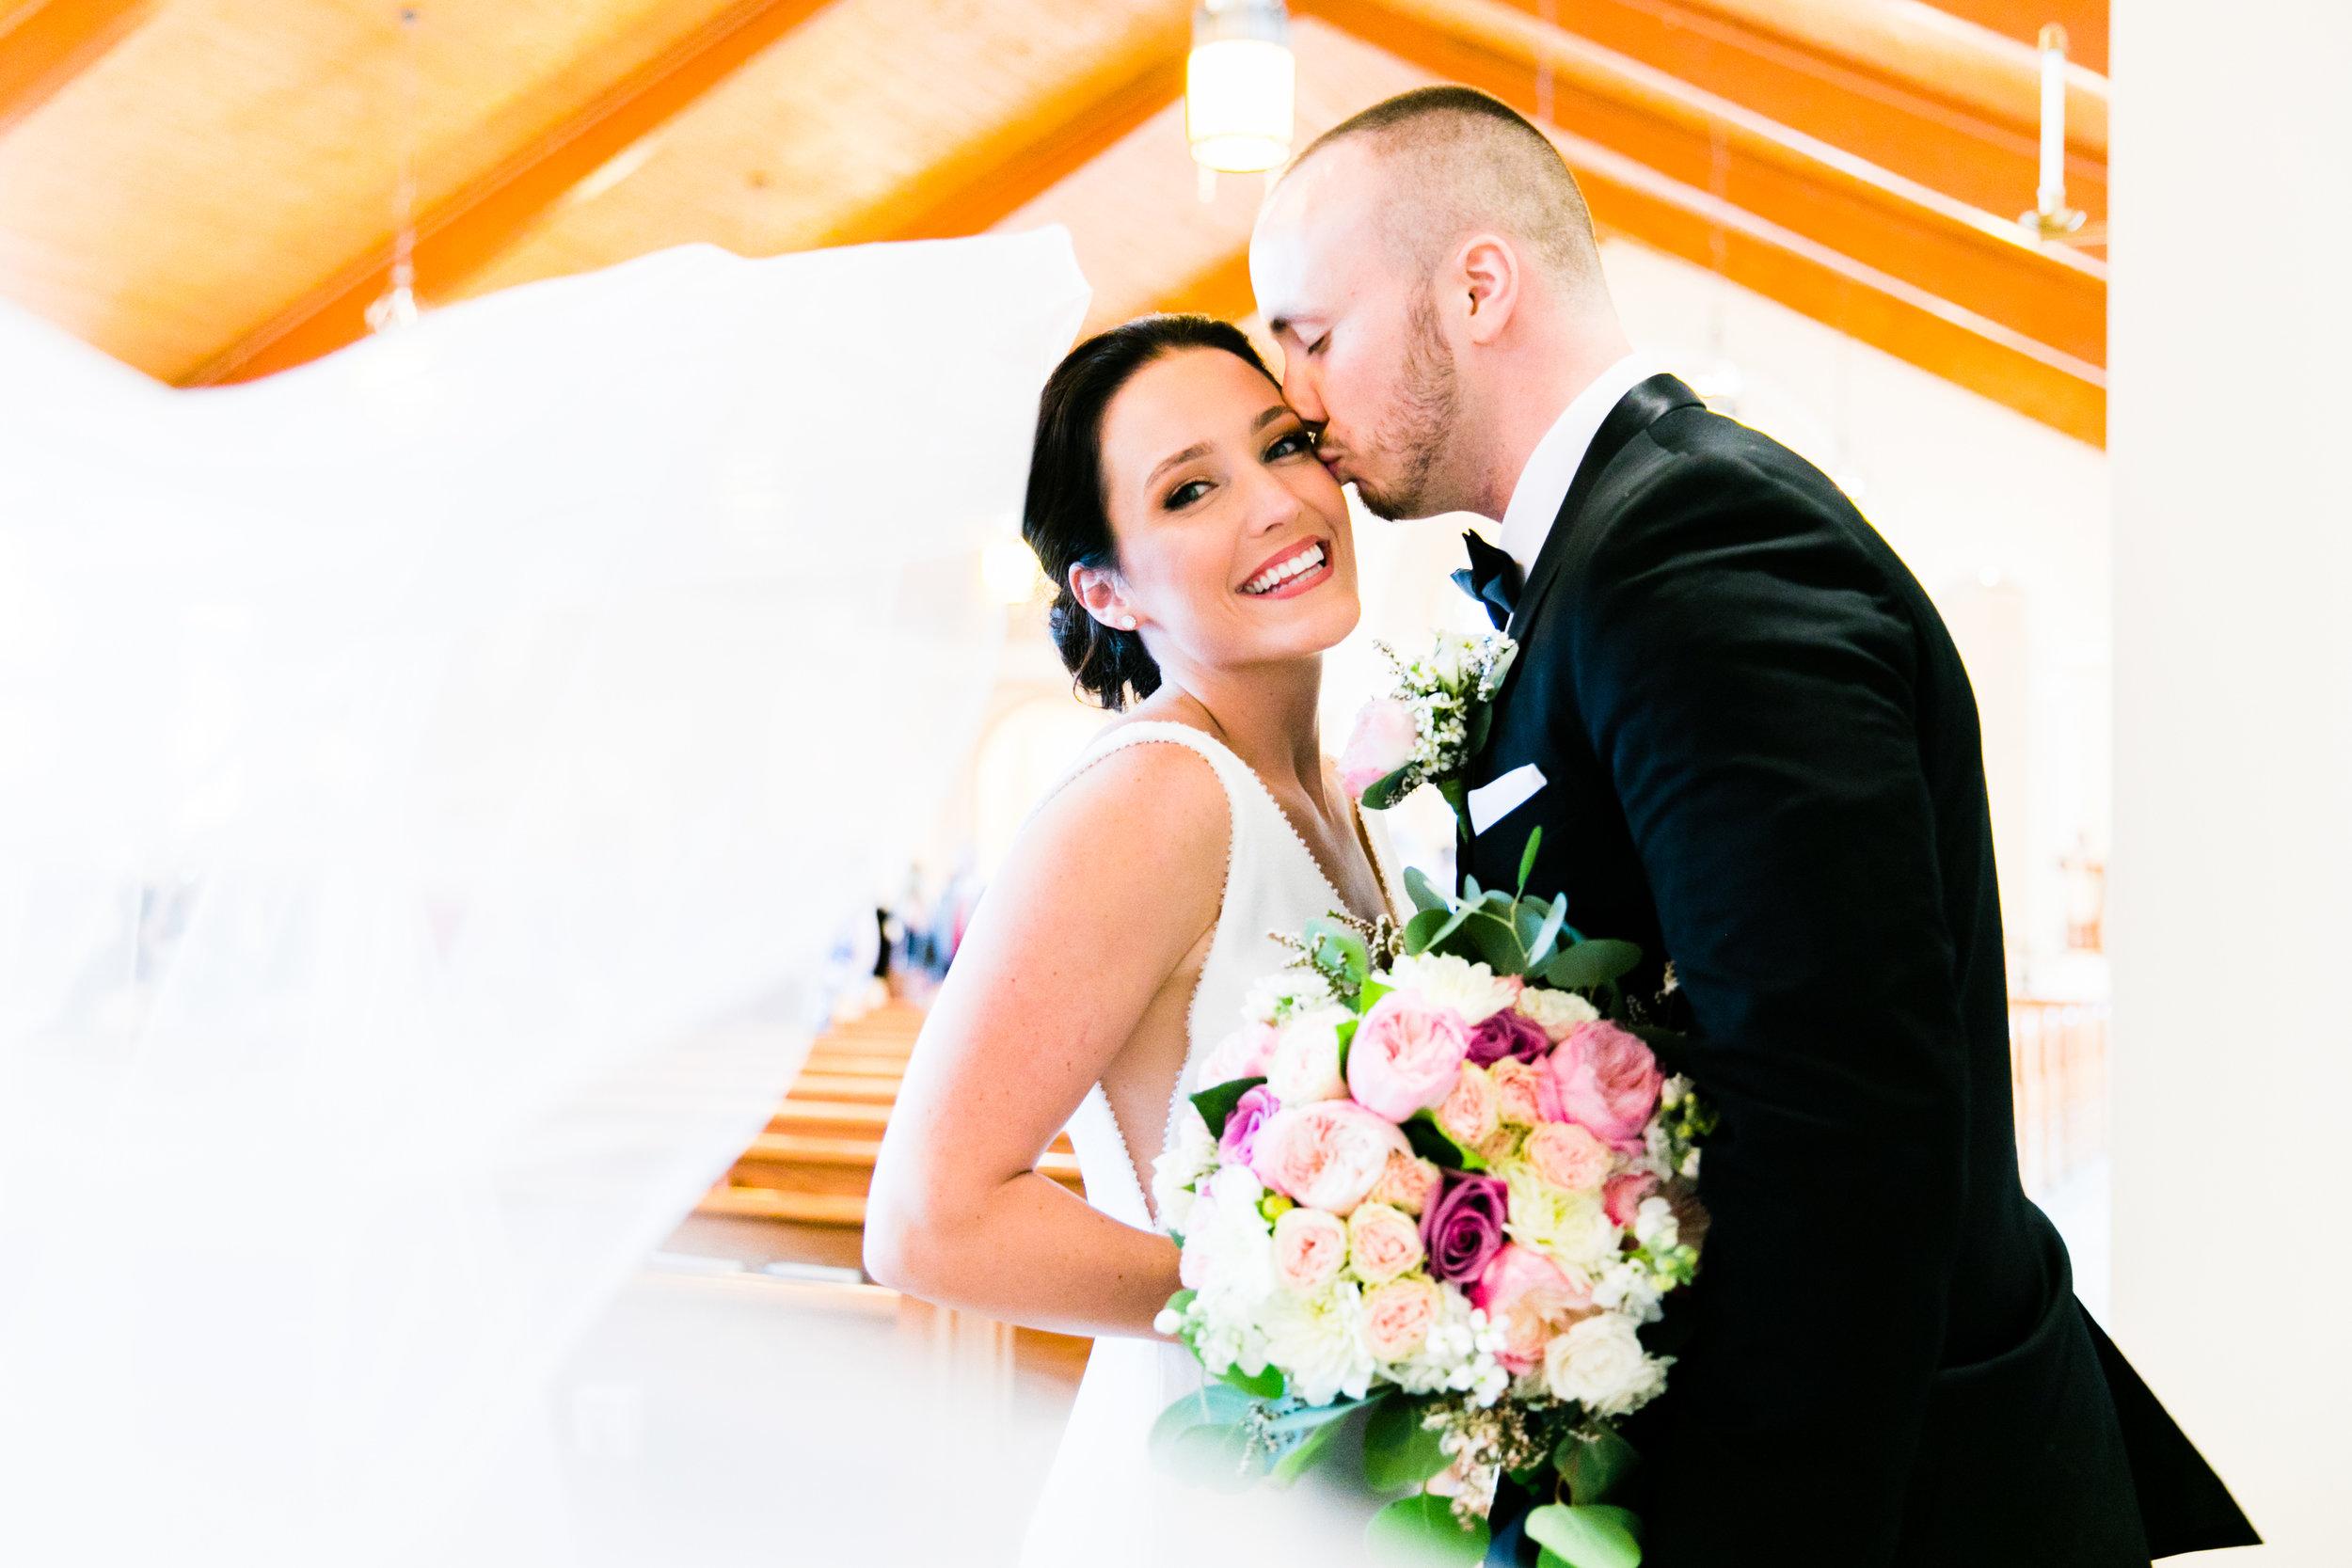 Sam and Mikes Wedding Photos - Pen Ryn Estate - 410.jpg